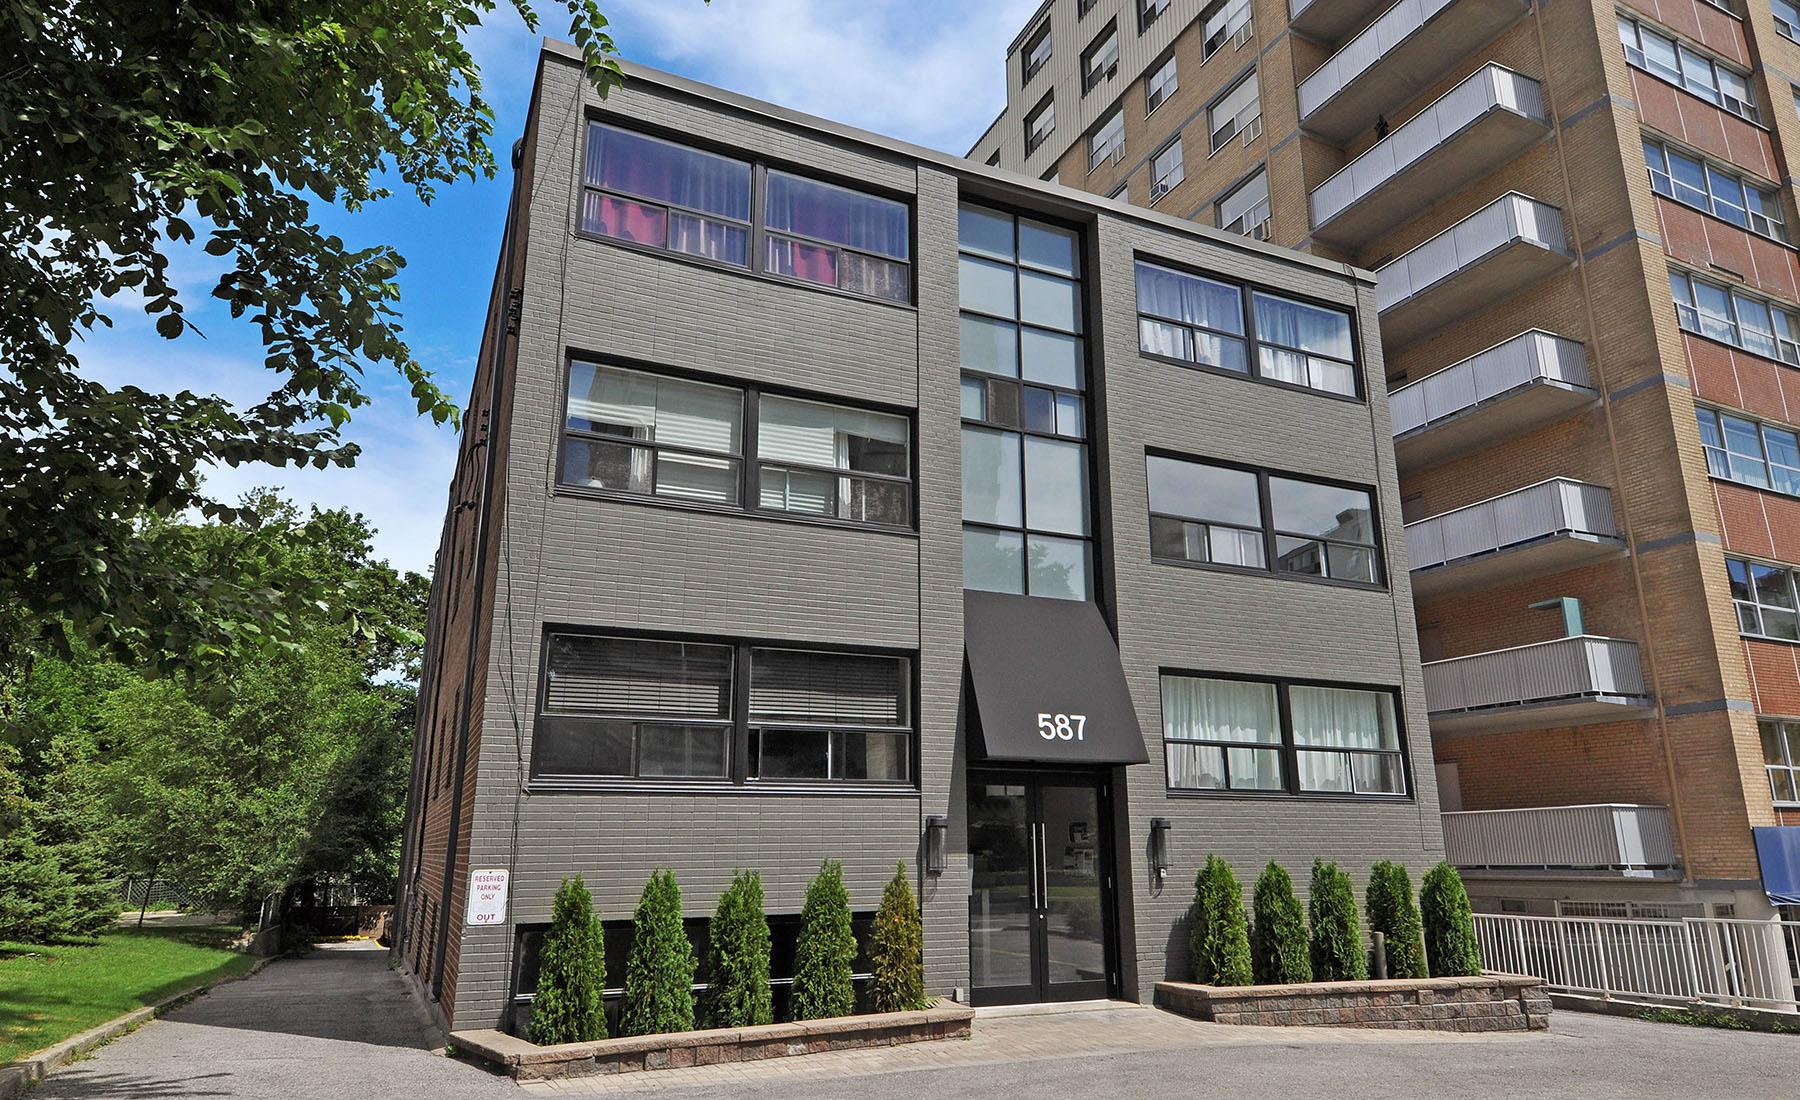 Fine 587 Avenue Hollyburn Properties Download Free Architecture Designs Sospemadebymaigaardcom